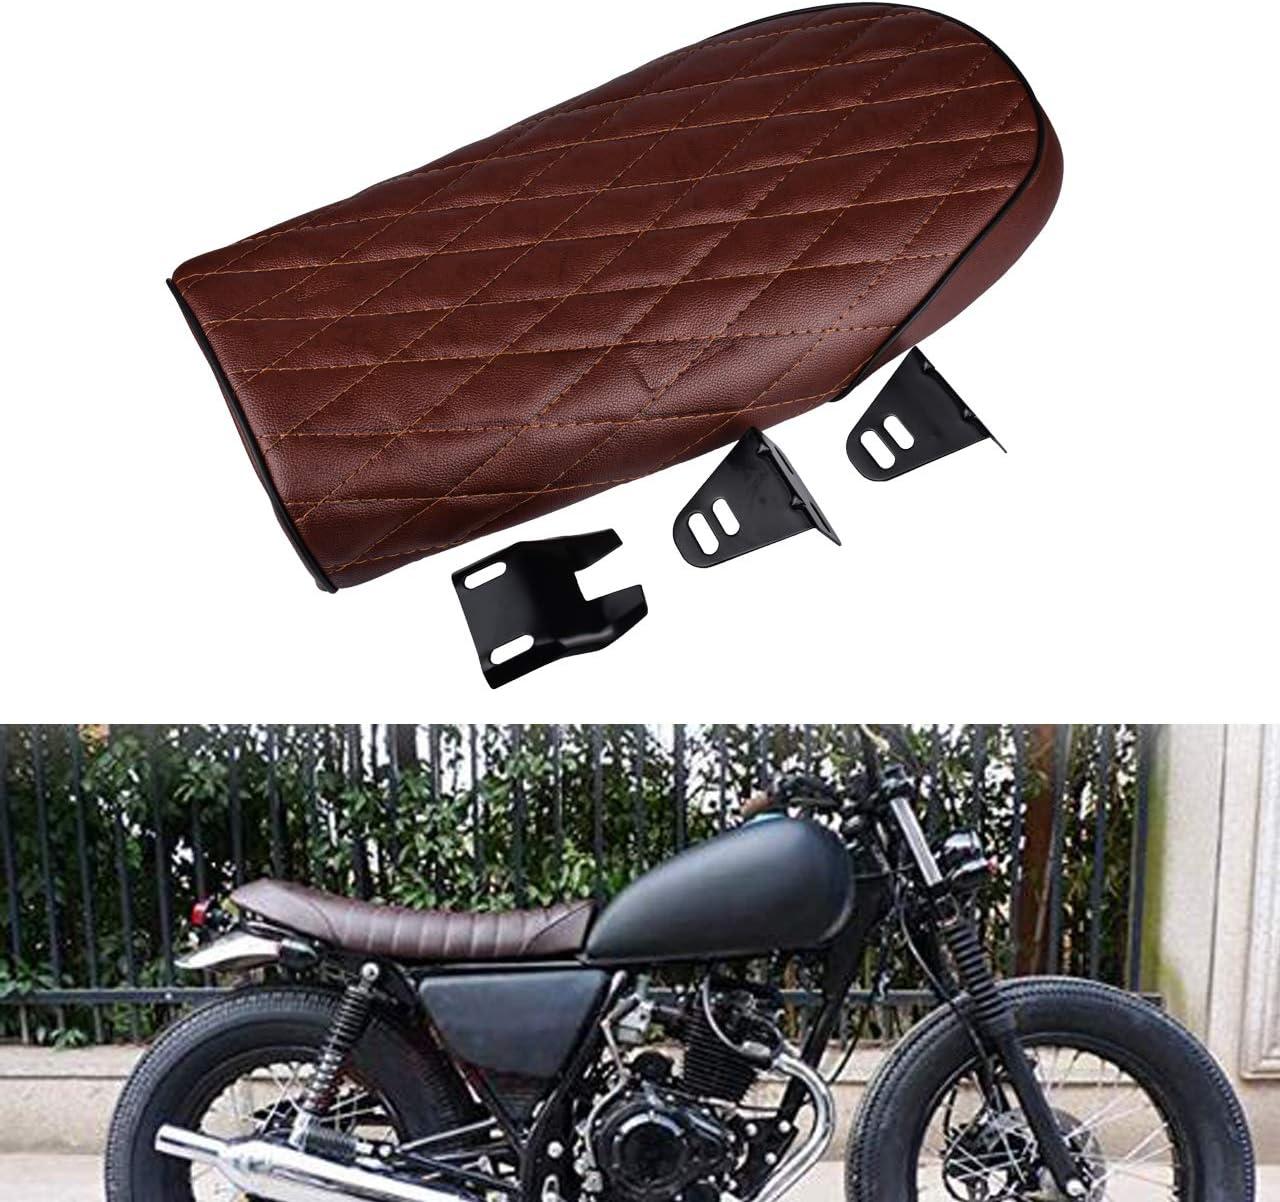 Lorenlli Asiento Universal Cafe R Hecho de Cuero Impermeable Acolchado con Esponja Universal para Motocicleta Honda CG Series